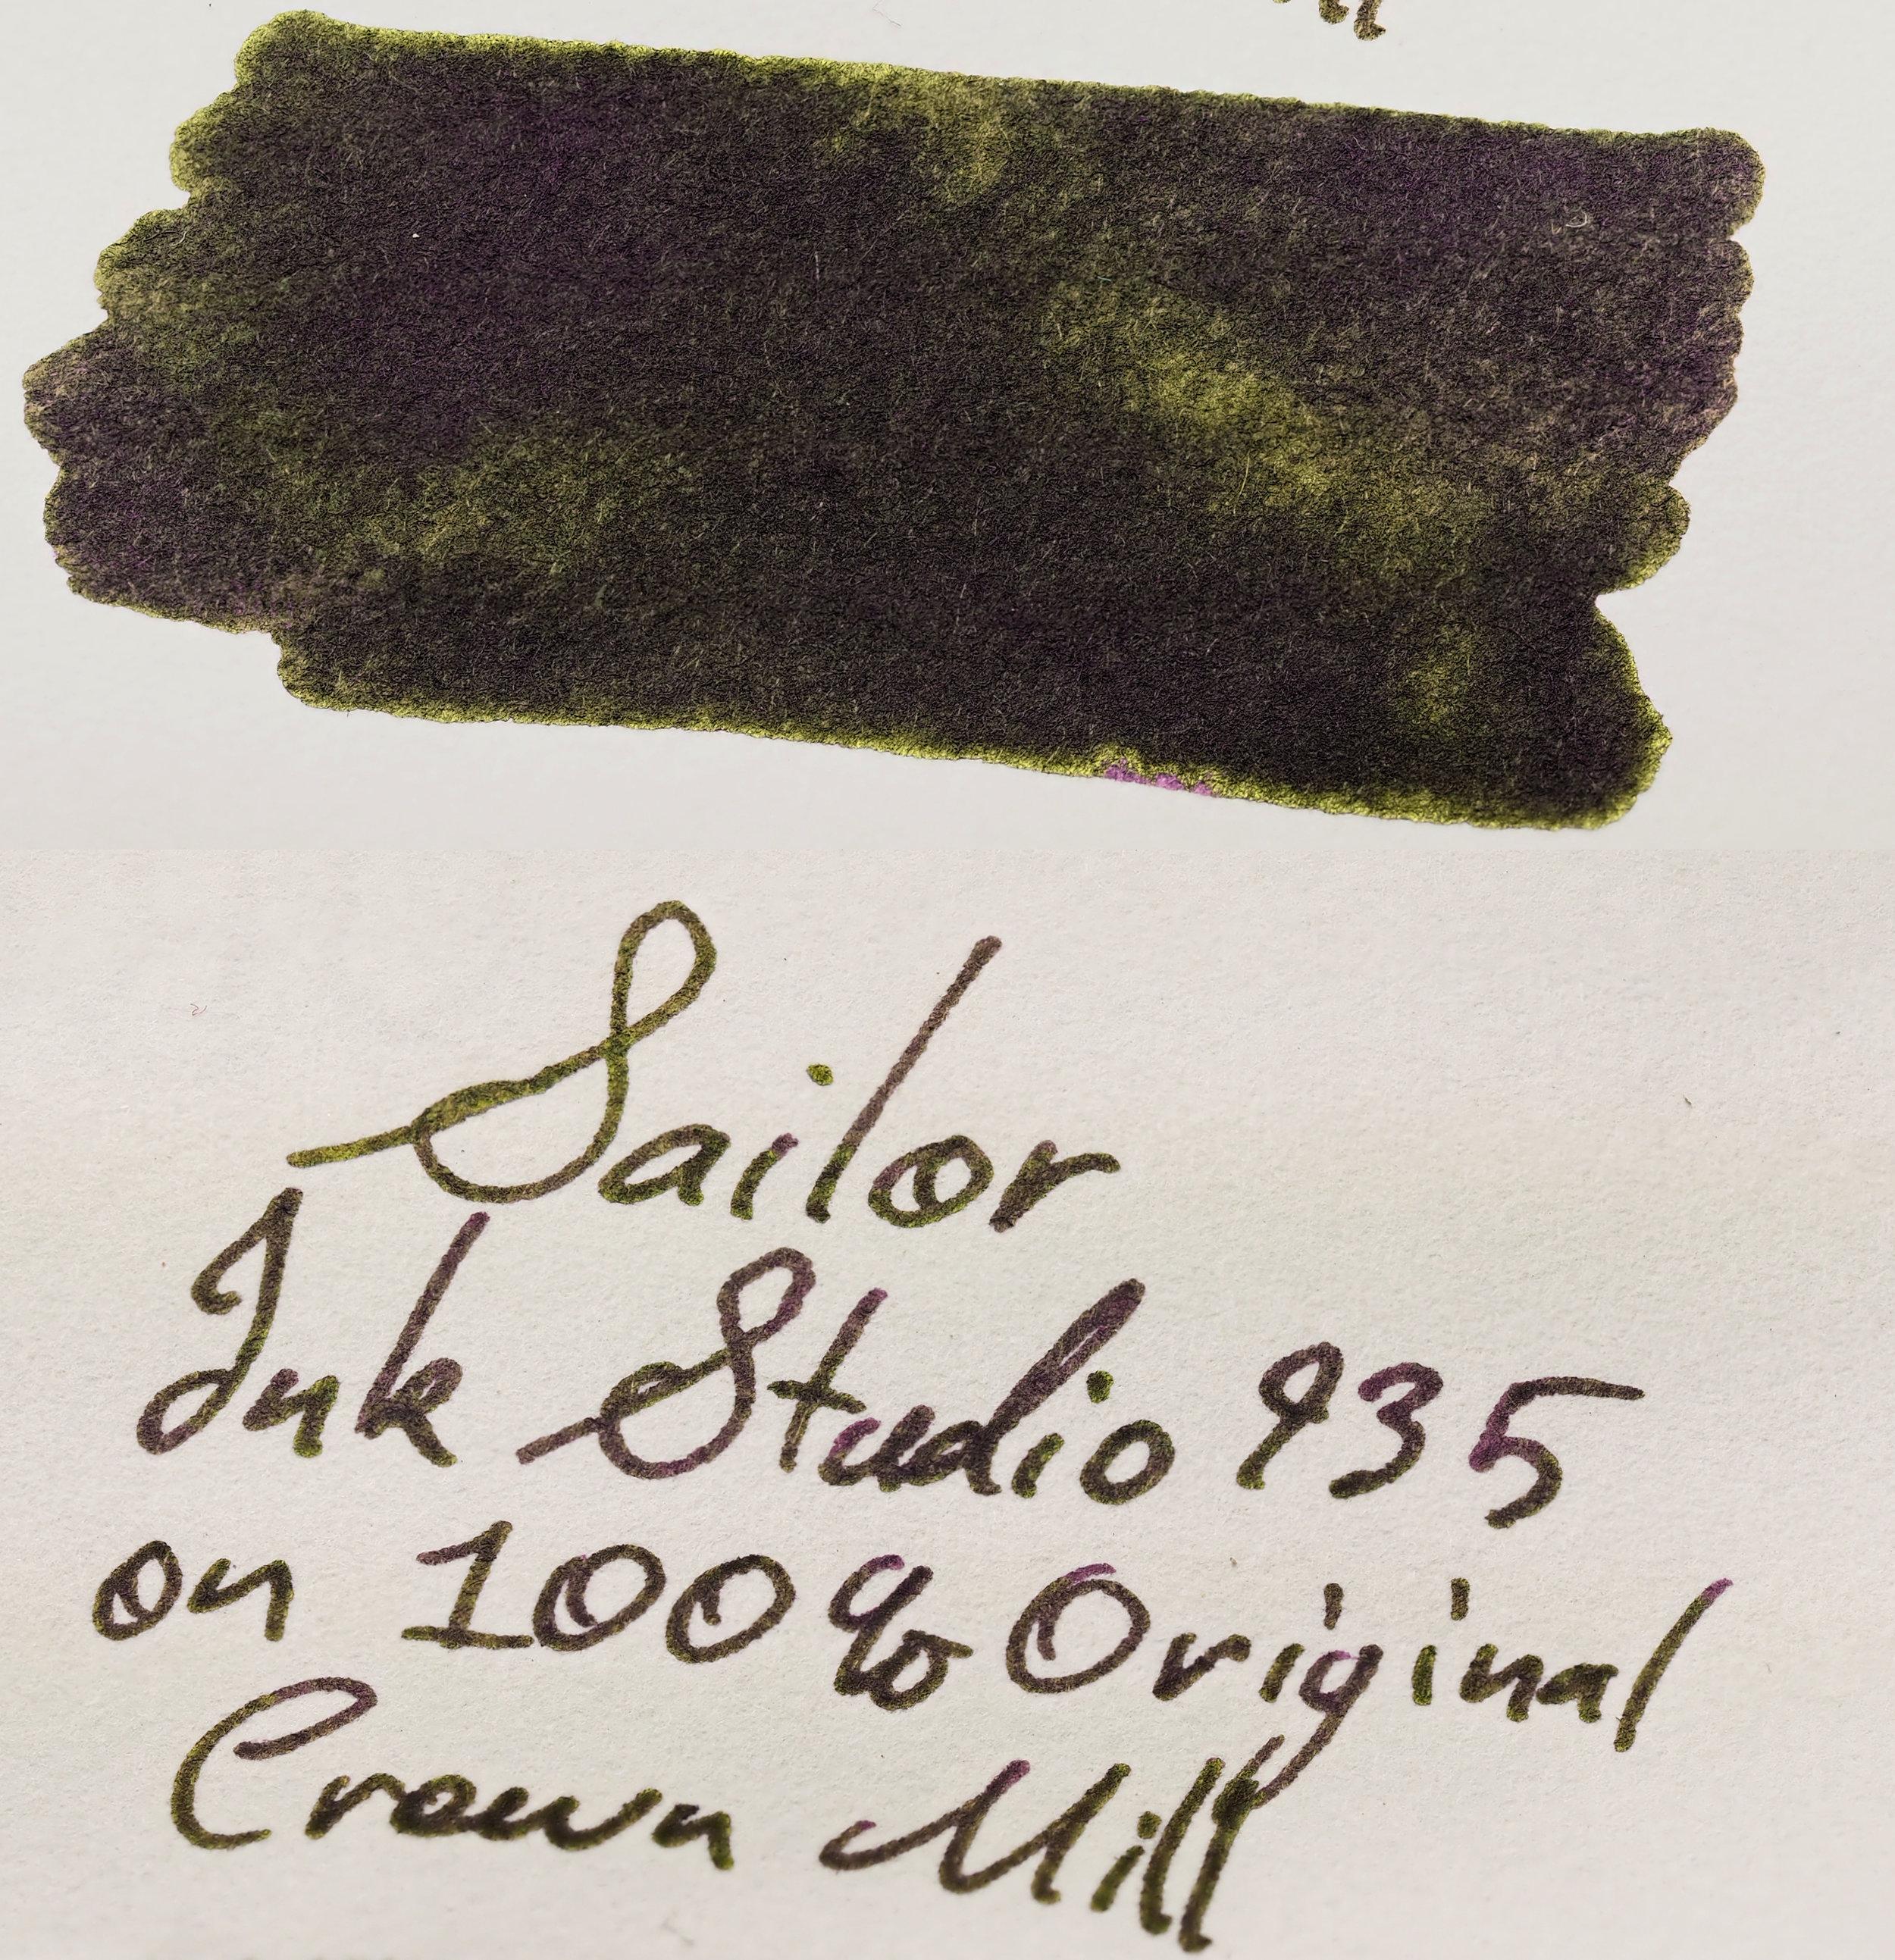 Sheen Original Crown Mill 100% Cotton